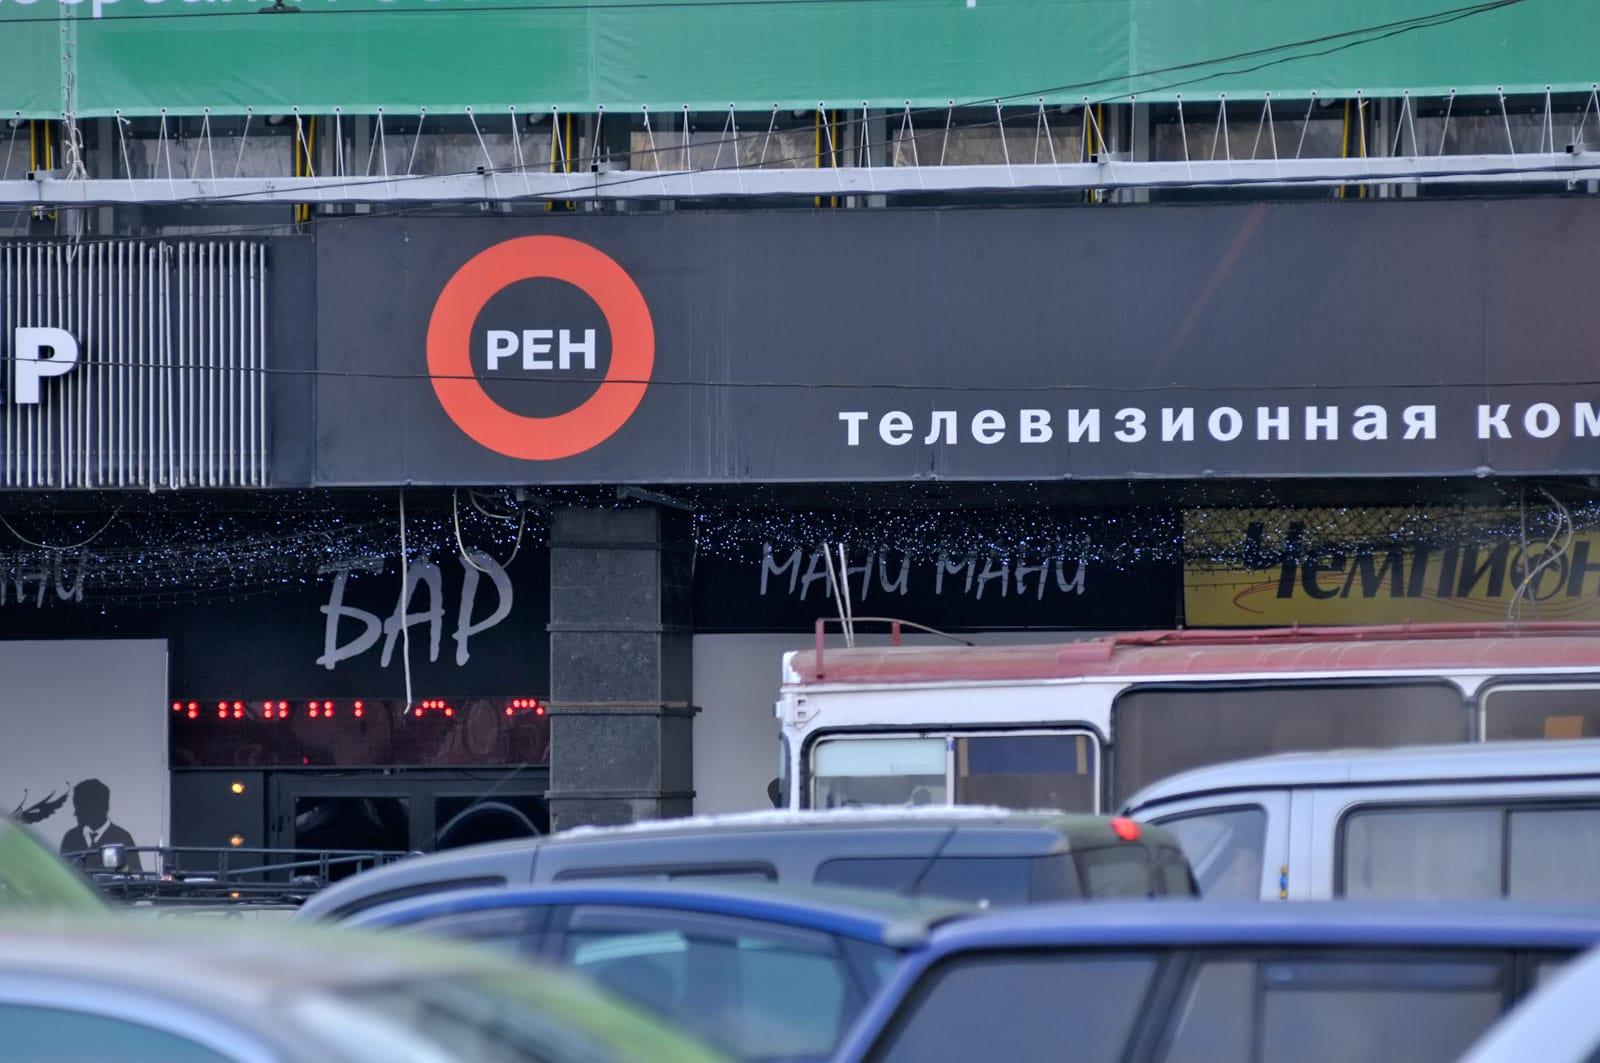 Канал РЕН ТВ «нарисовал» в документах ремонт офиса на 14 миллионов рублей, но проиграл суд налоговикам